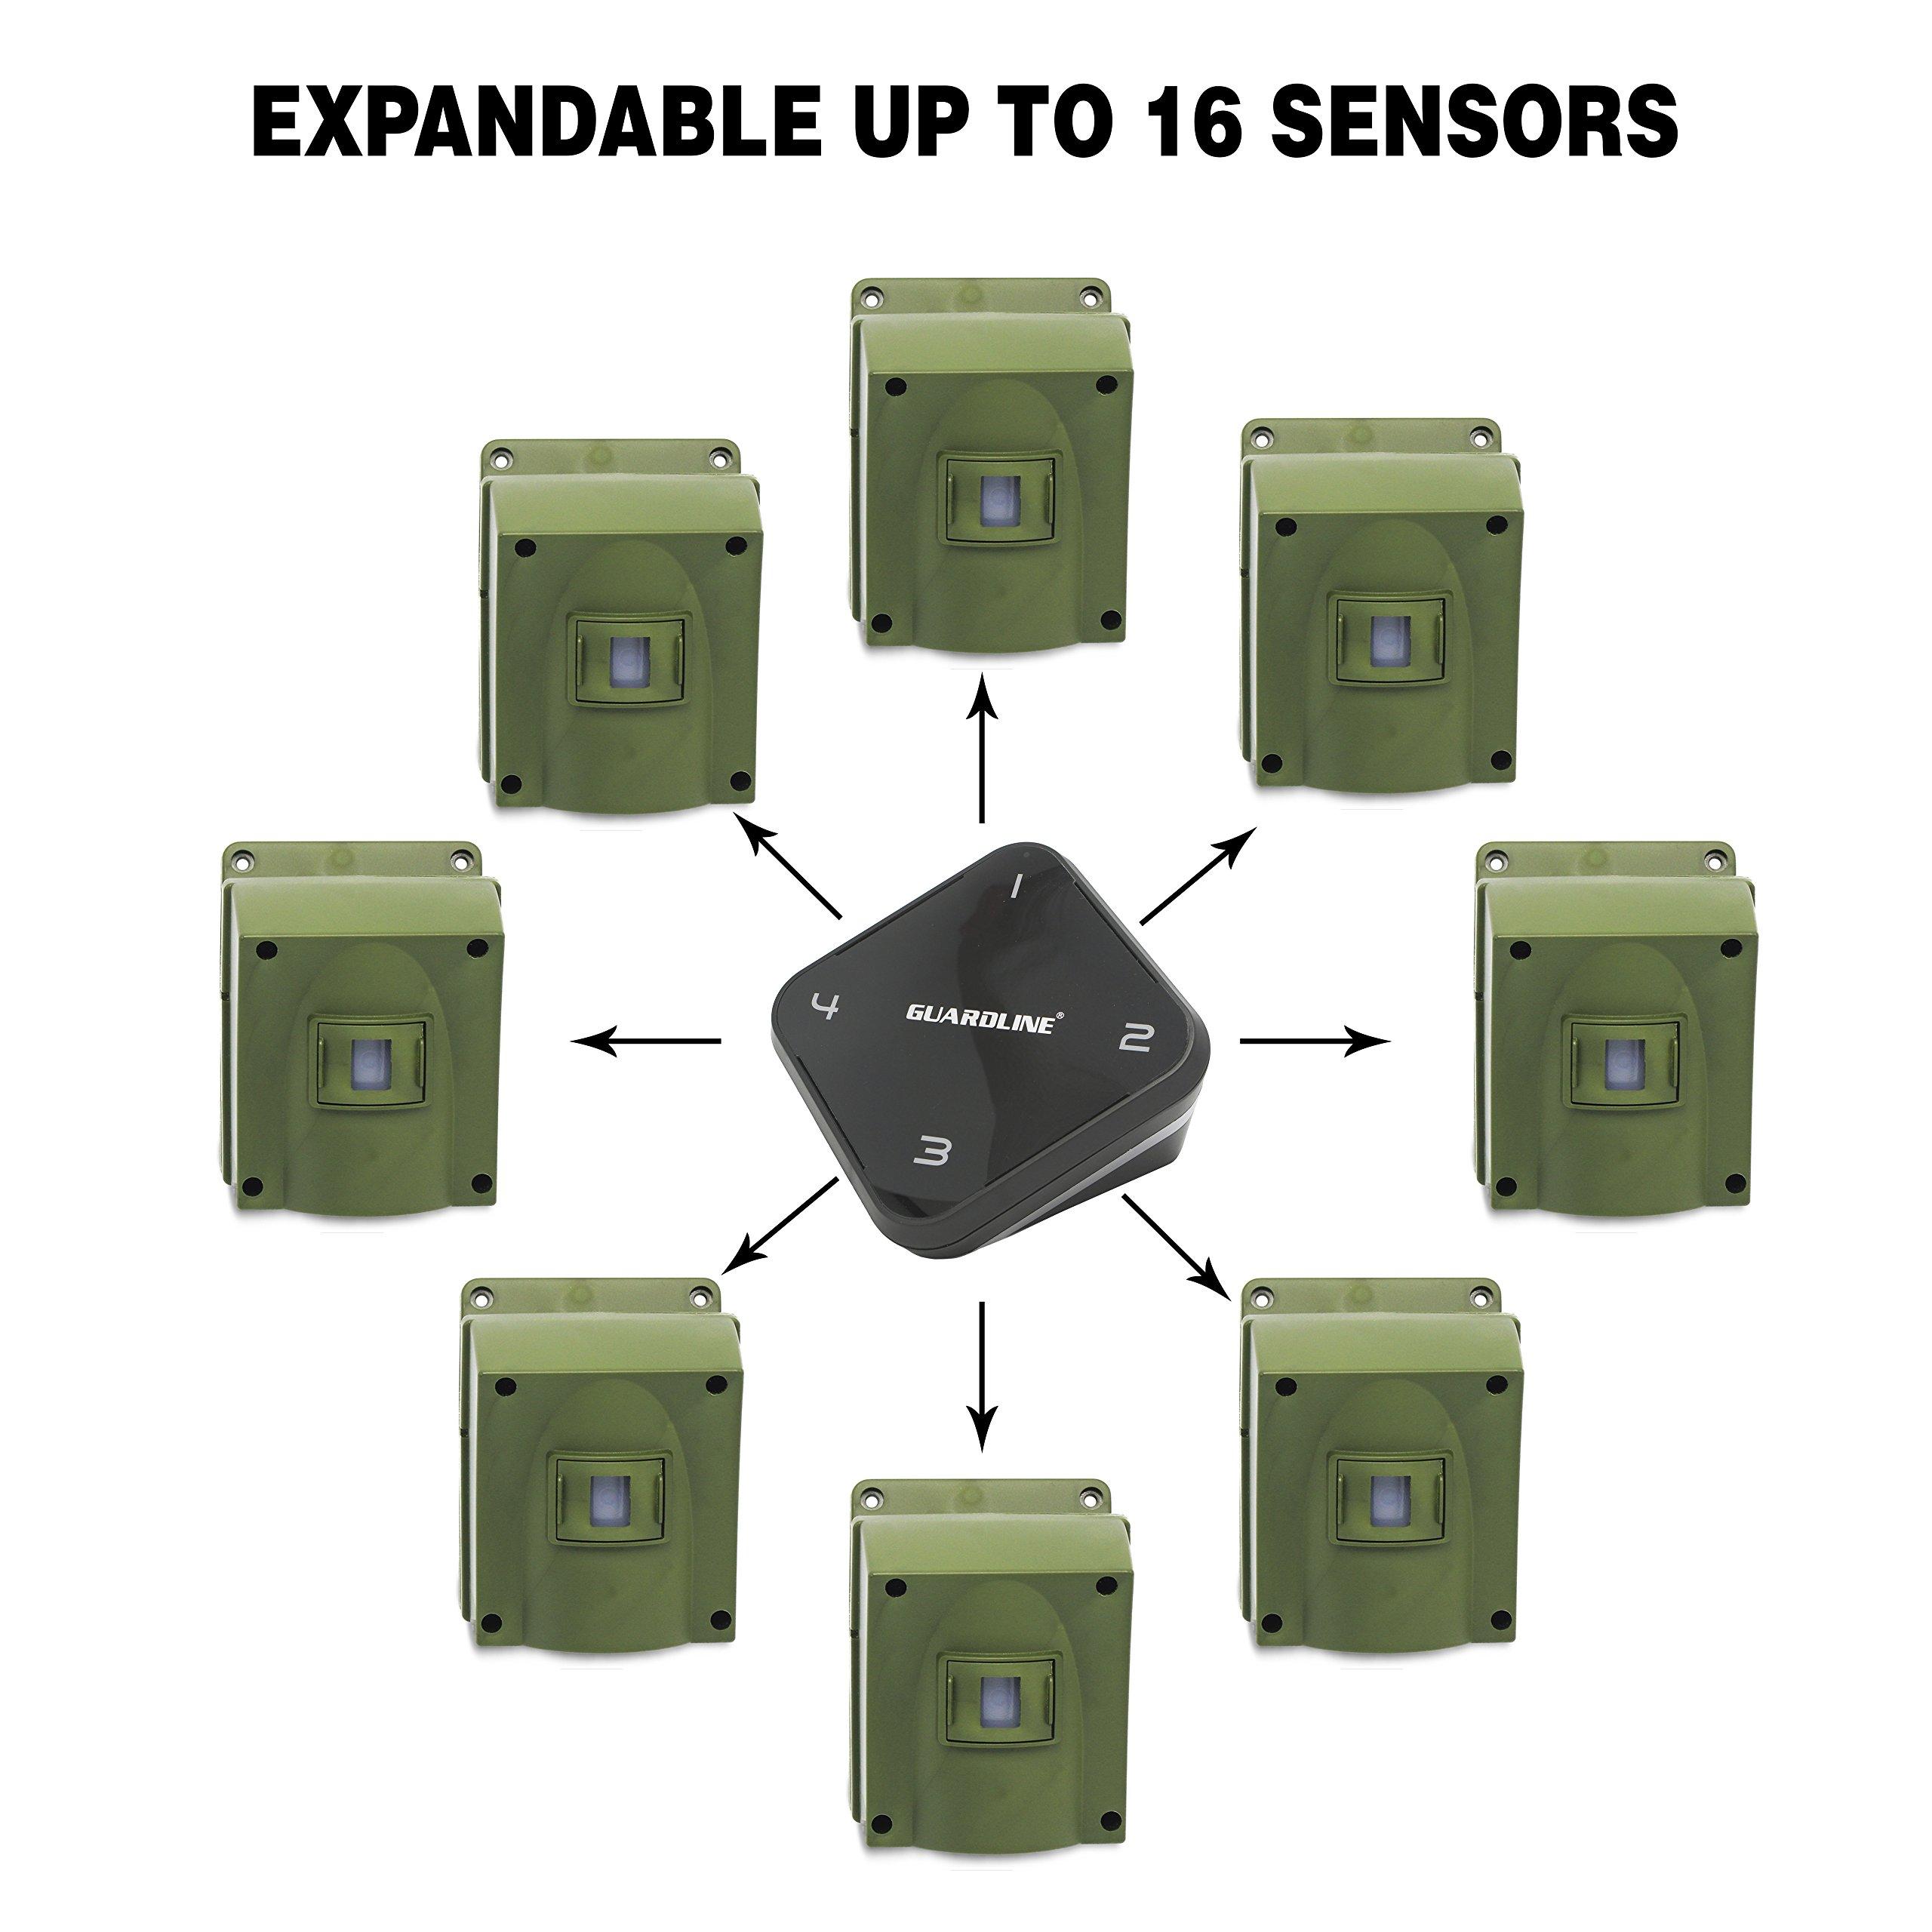 Extra Sensor for 1/4 Mile Long Range Driveway Alarm by Guardline by Guardline (Image #5)